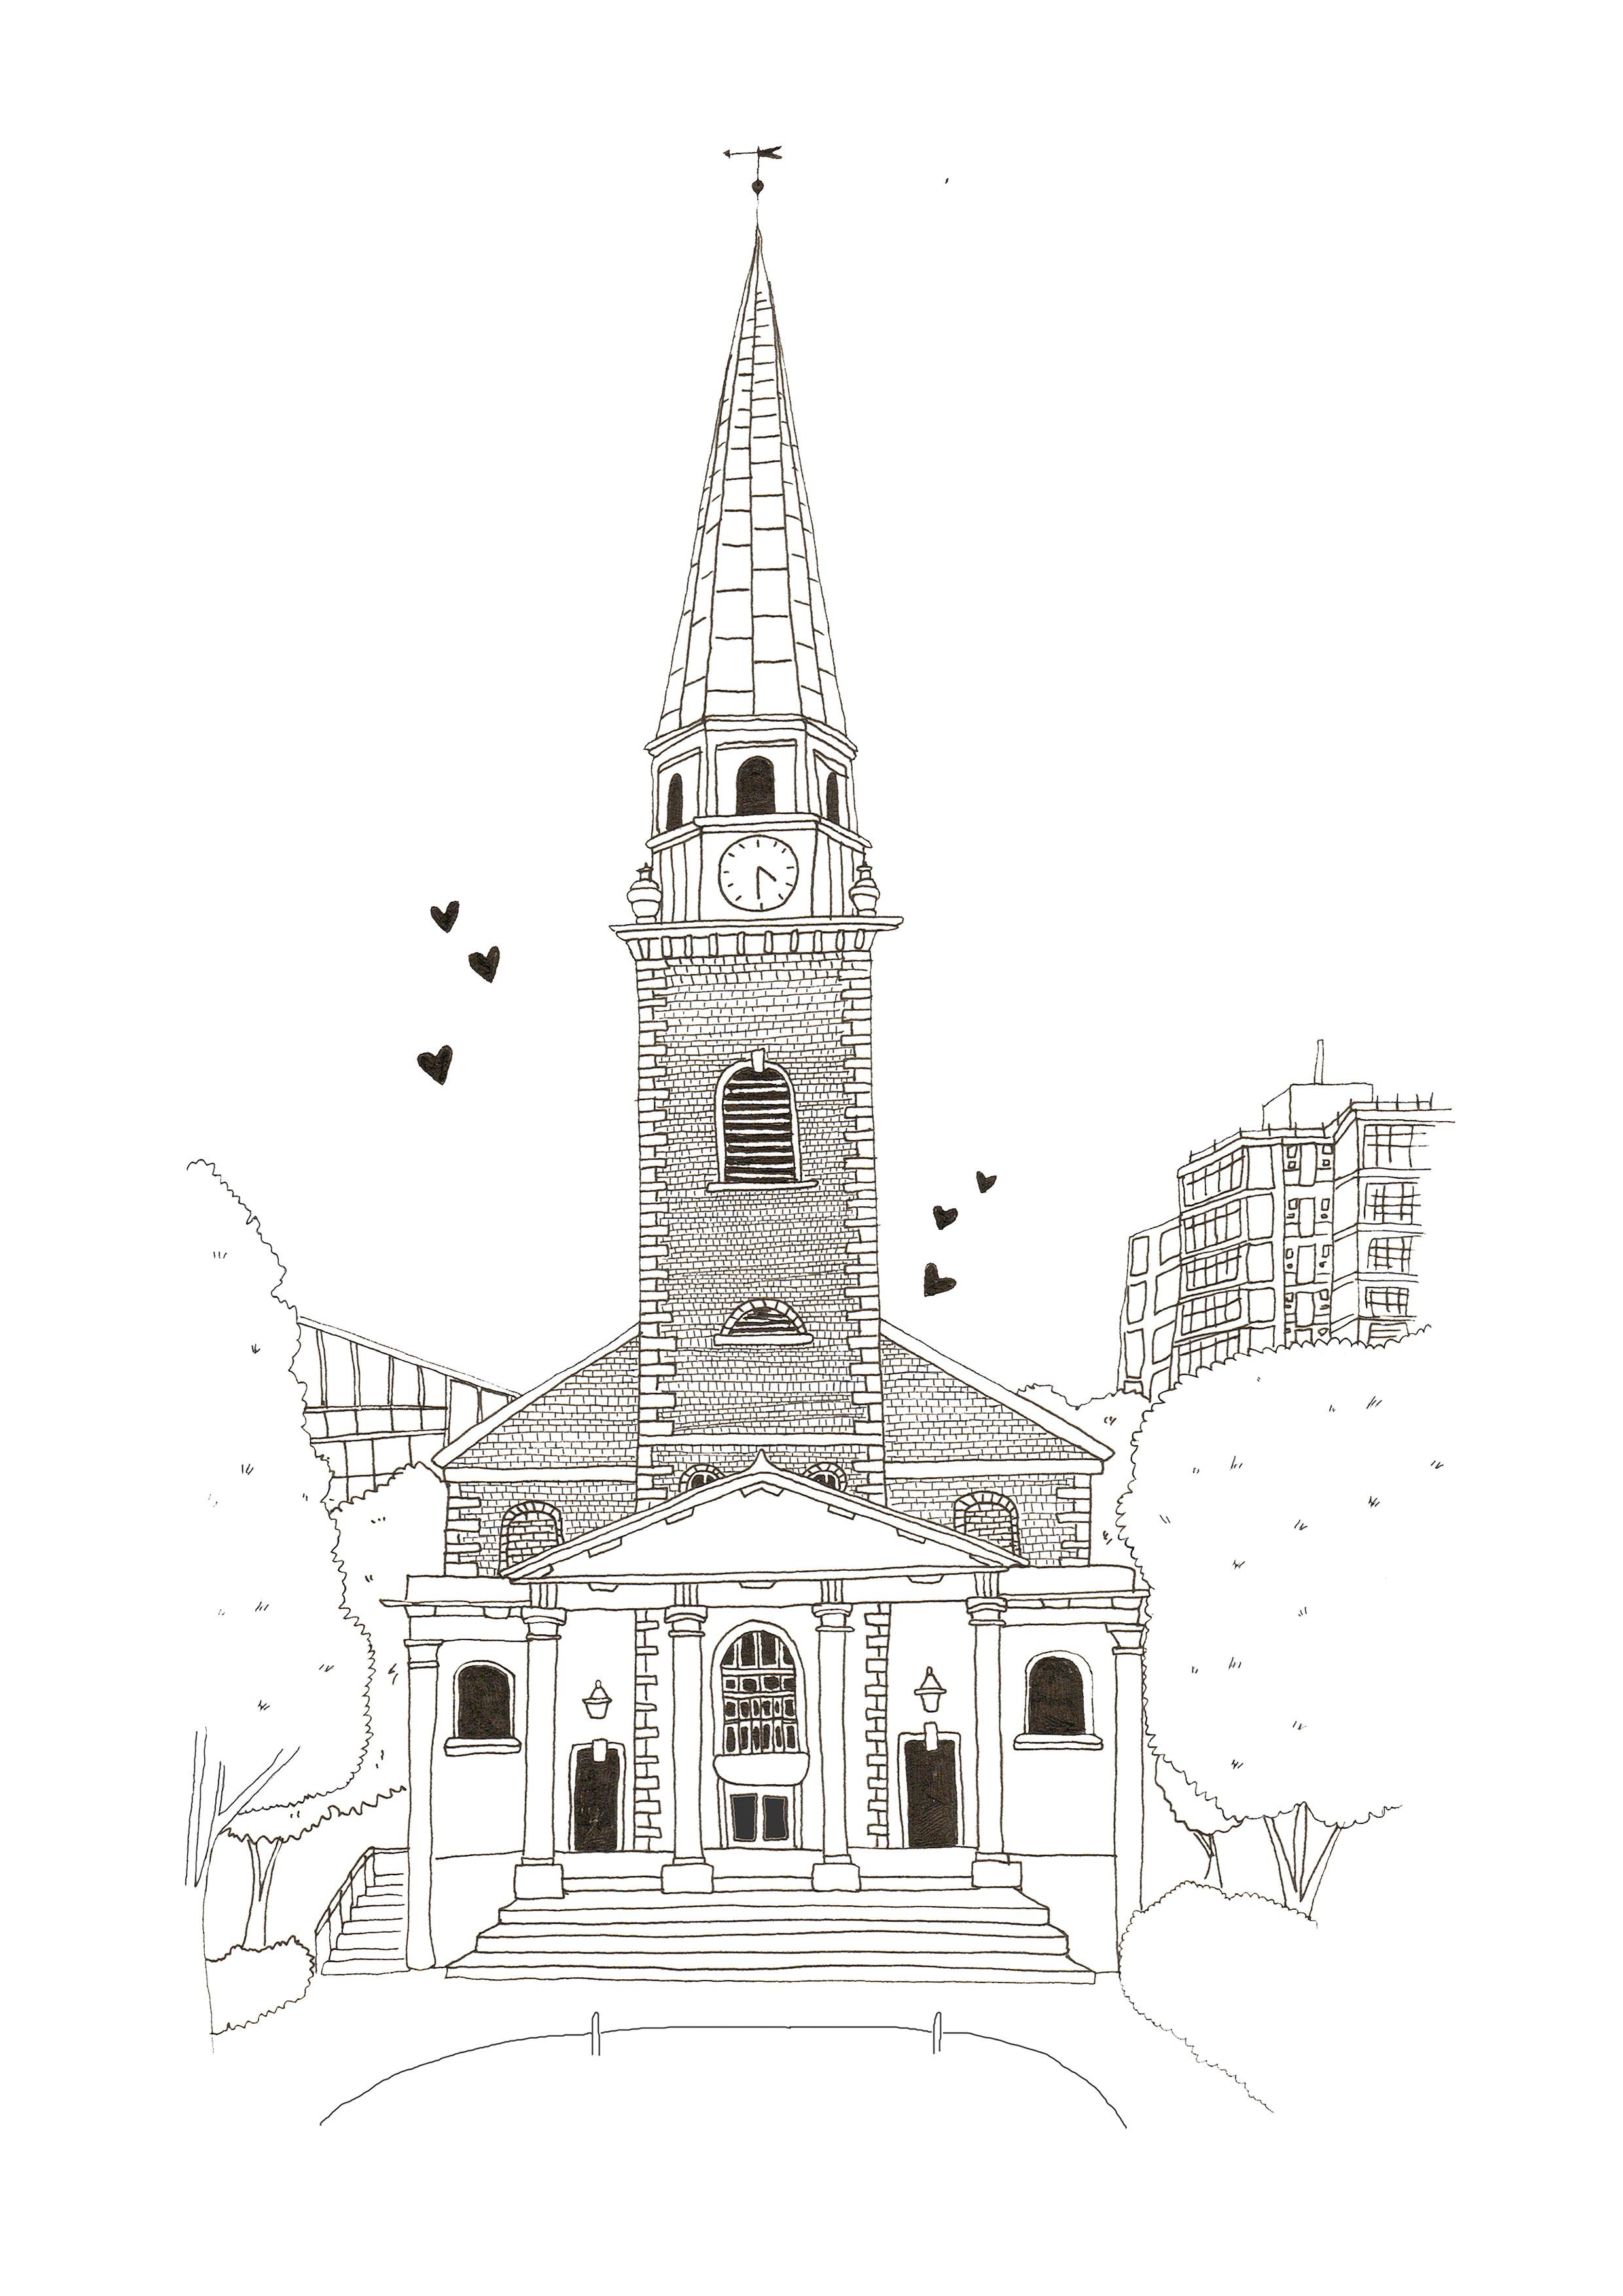 st-marys-church-battersea-illustration